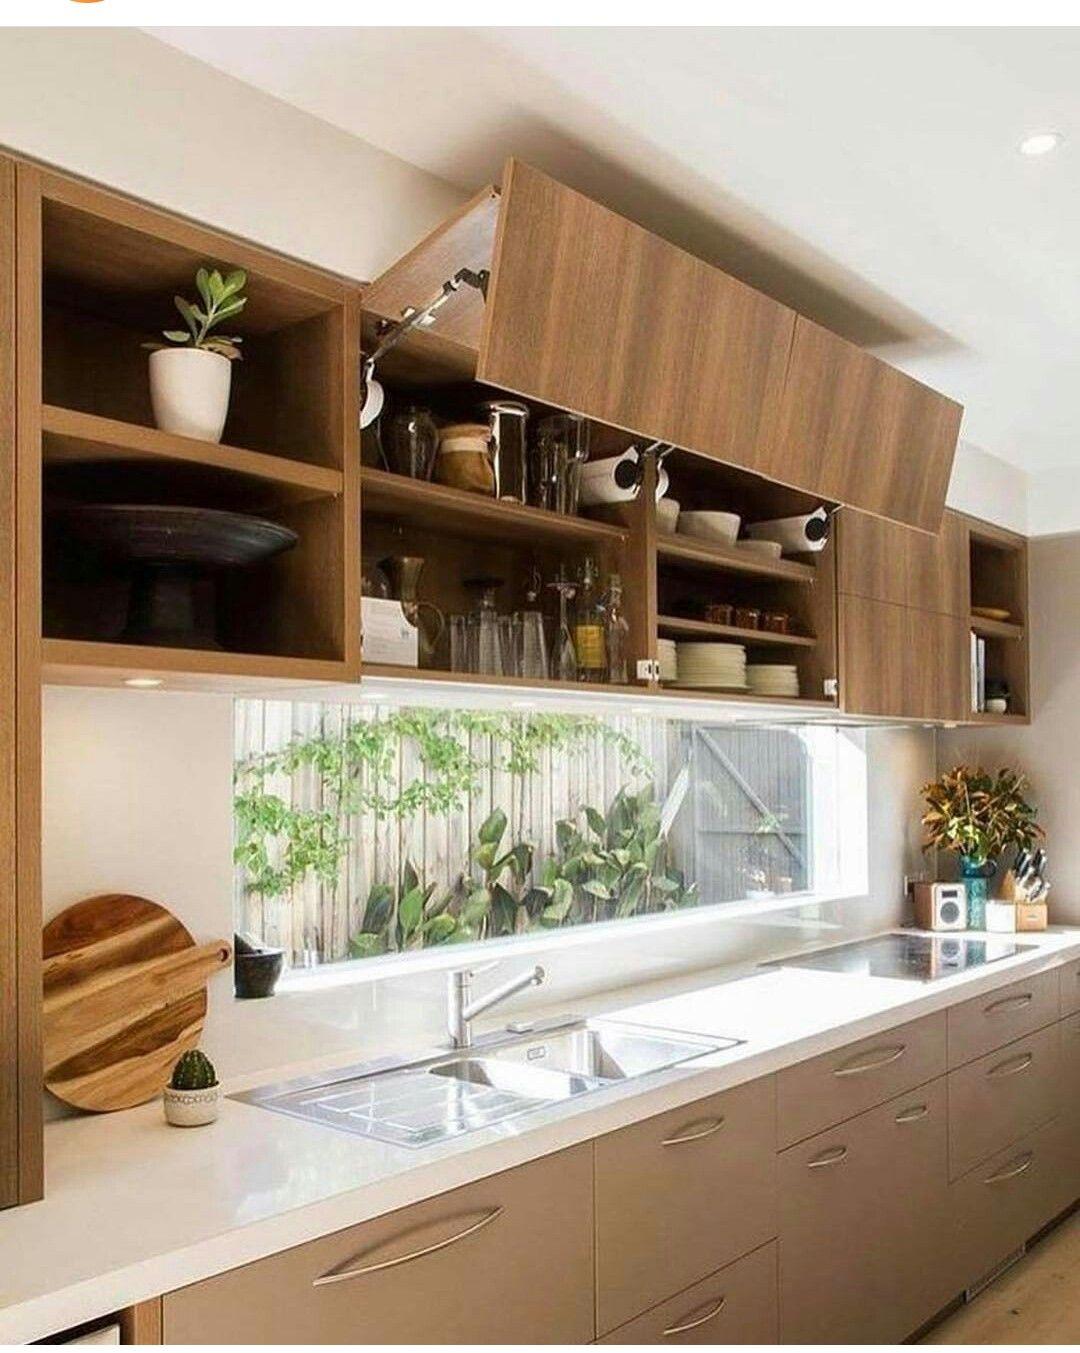 Pin by Web Casa on Casas modernas | Pinterest | Kitchen design ...